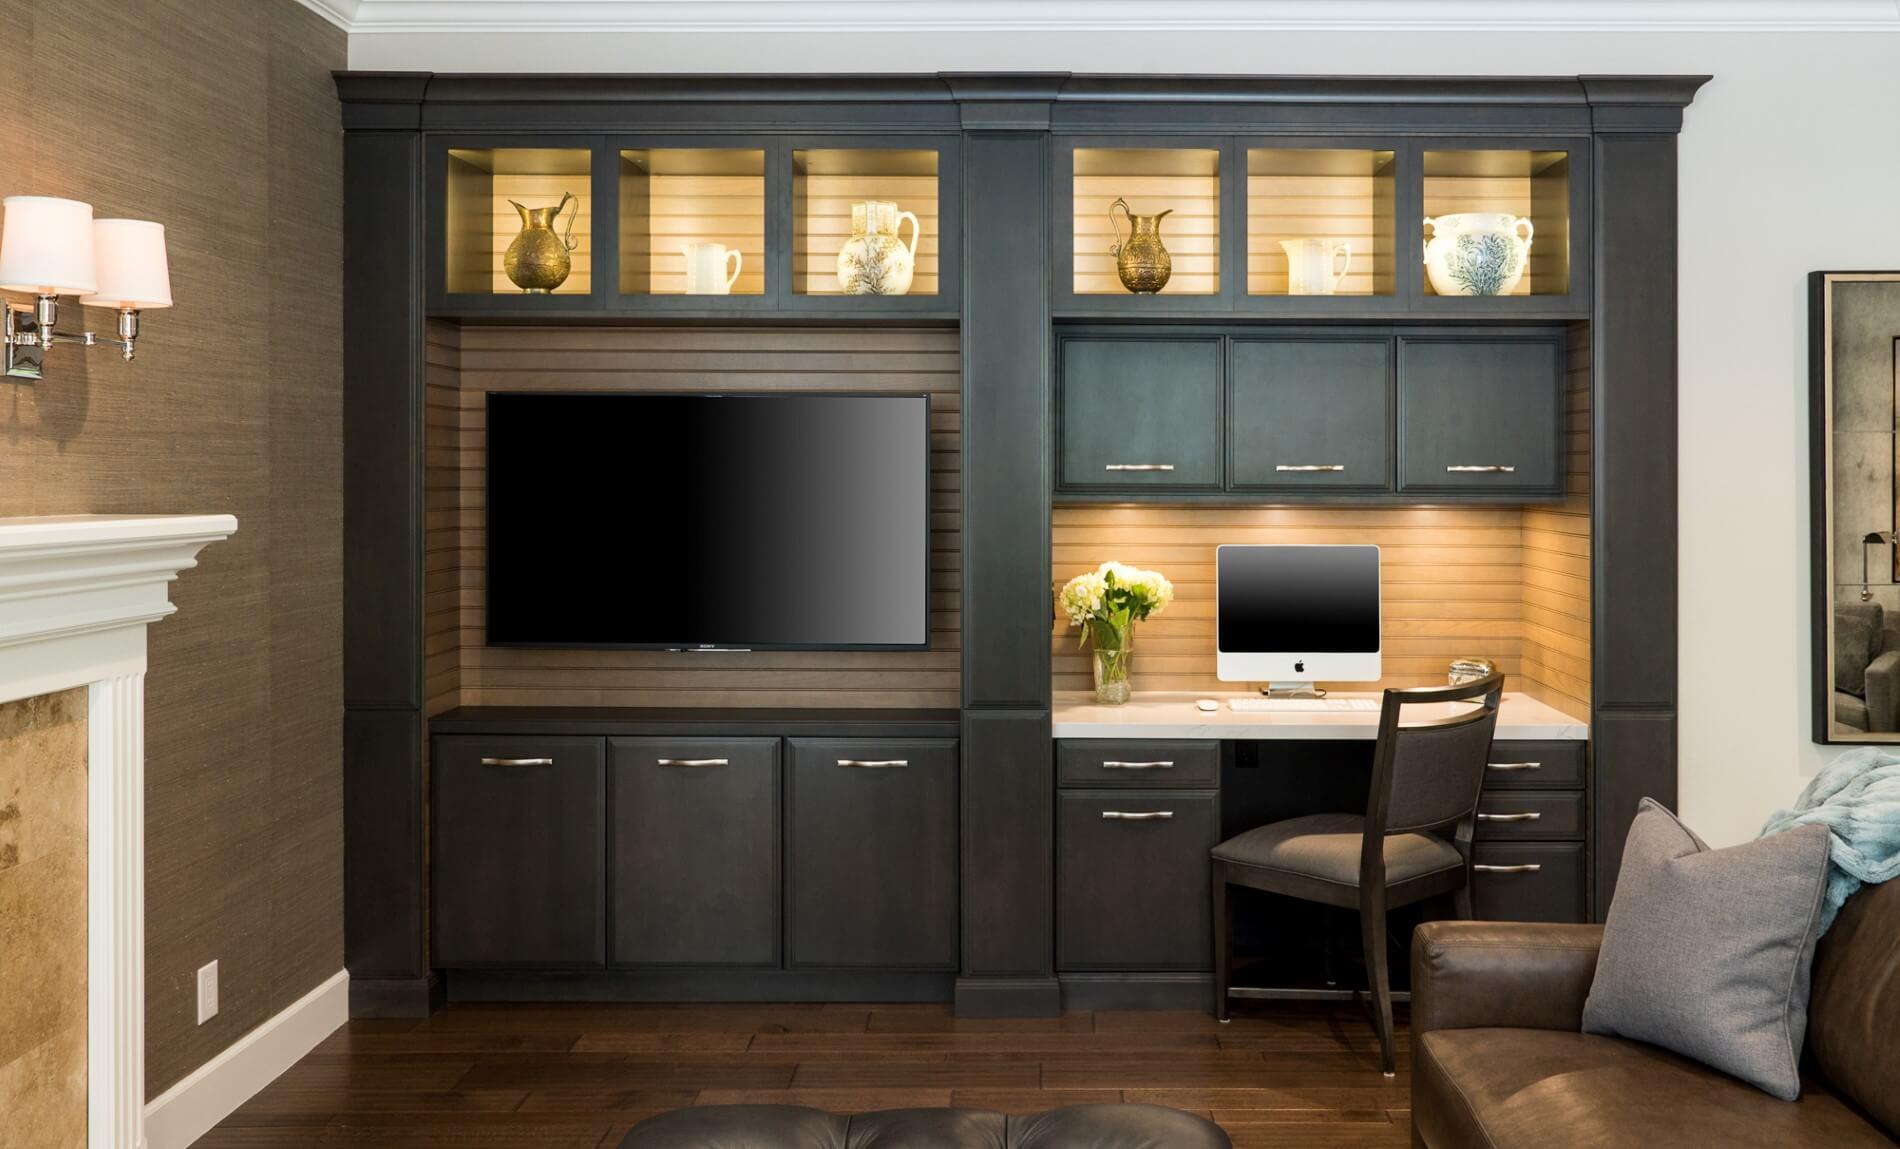 Built-in Desk Entertainment Area, Entertainment Area Design, Home Office Design